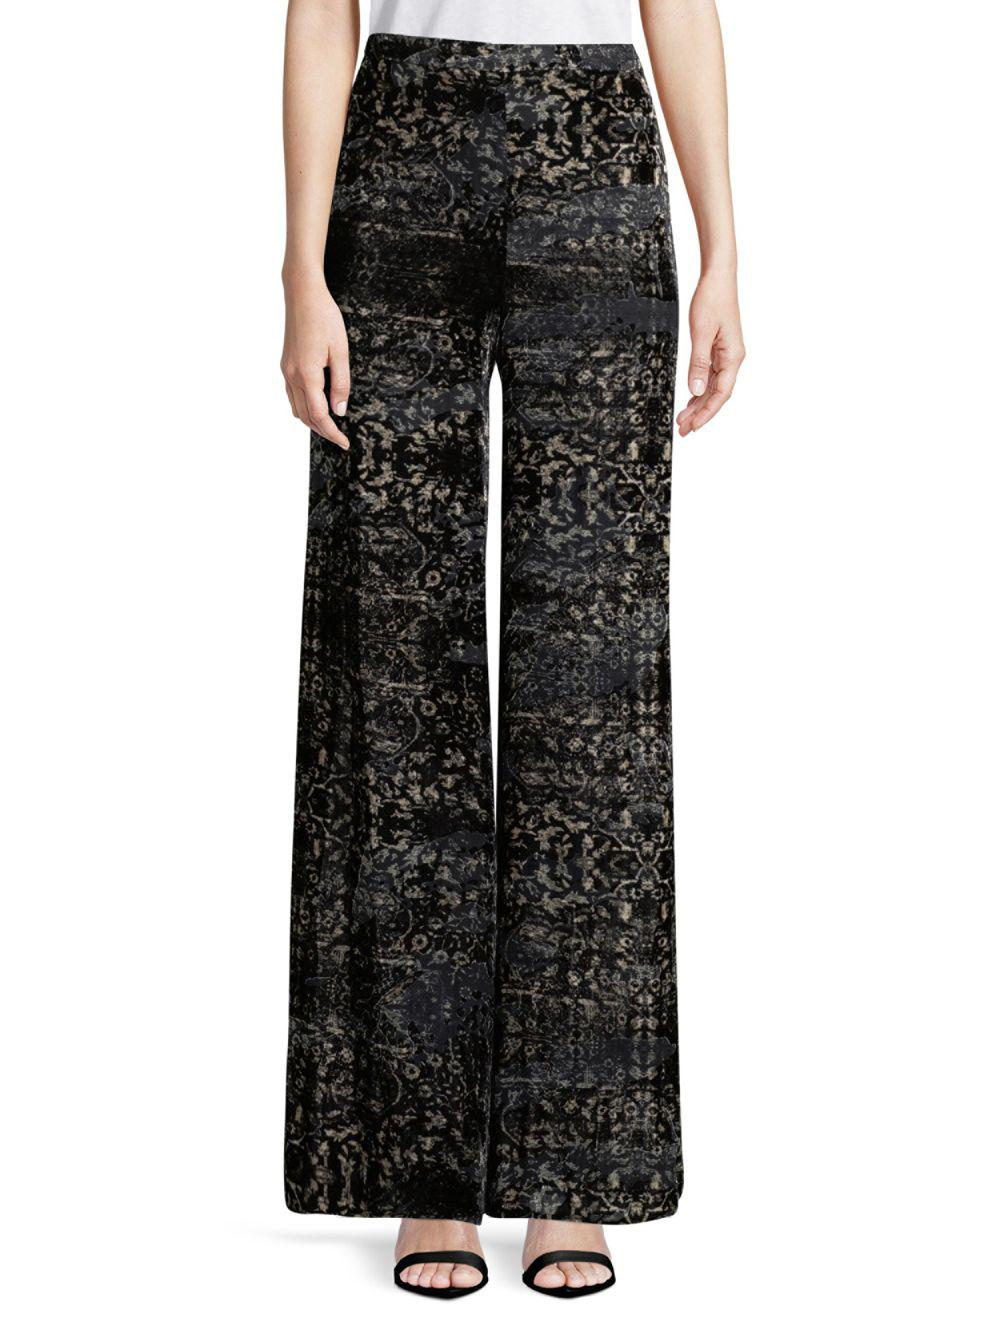 0f2b3acd194 Lyst - Haute Hippie Intricate Wide-leg Pants in Black - Save ...